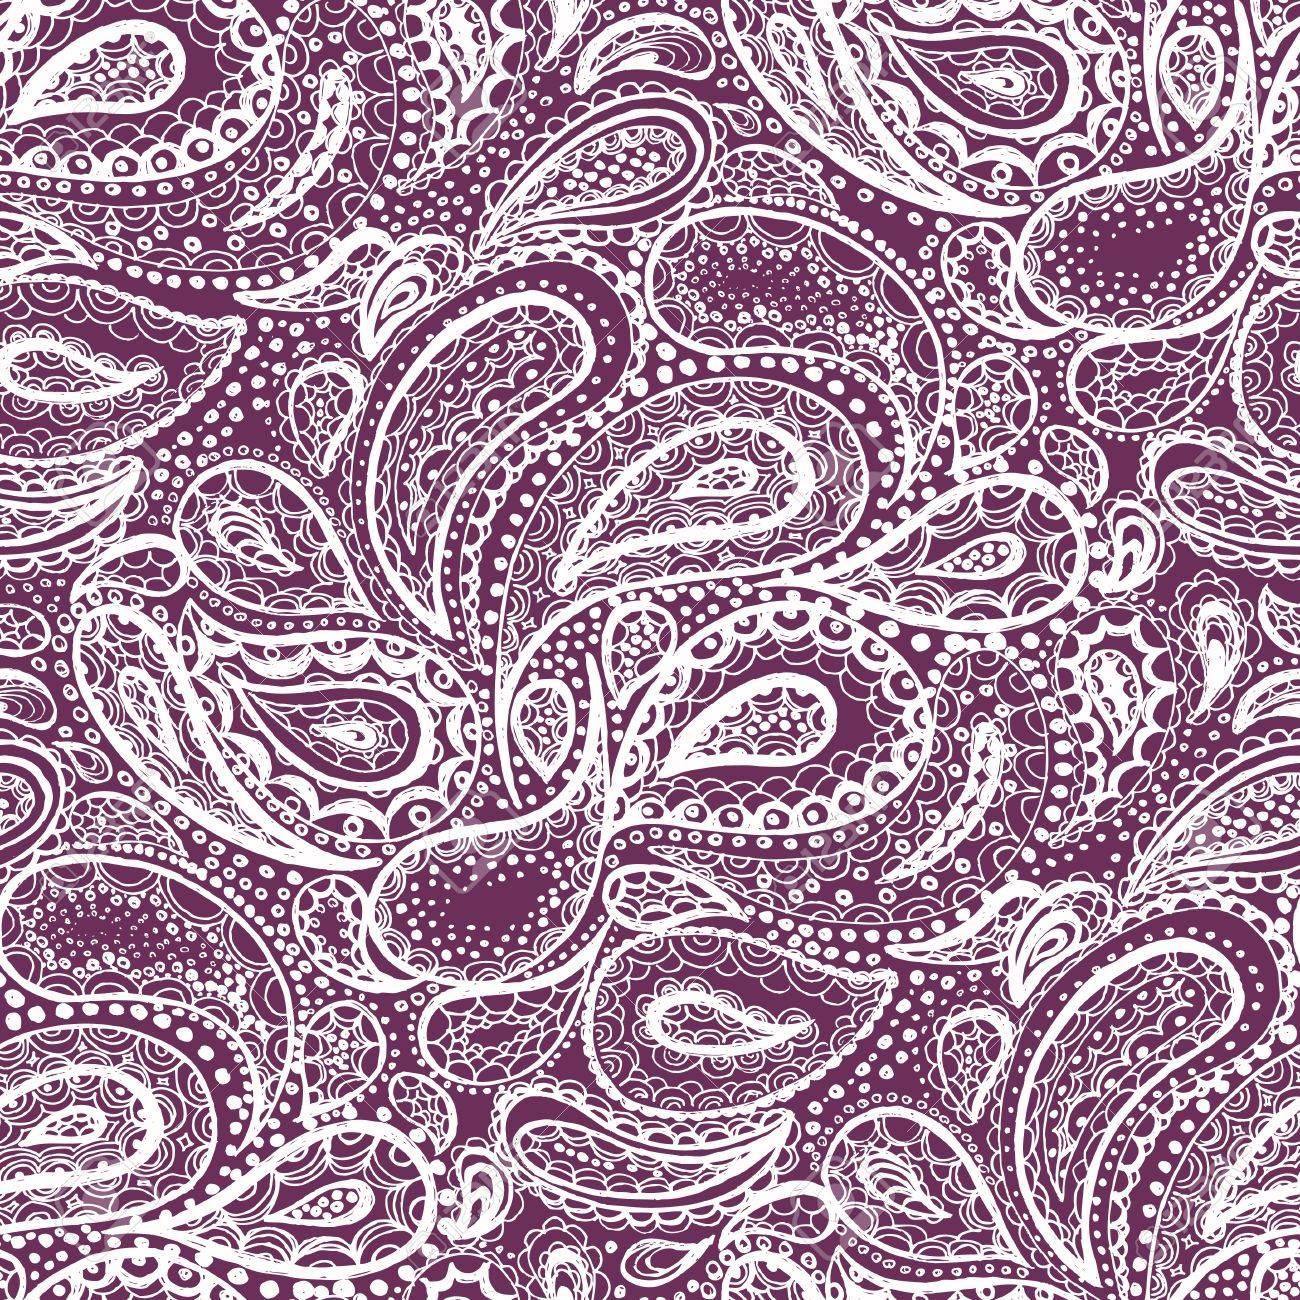 Mehndi ethnic tattoo henna zentangle doodle elements. Wallpaper textile seamless pattern Stock Photo - 52450116